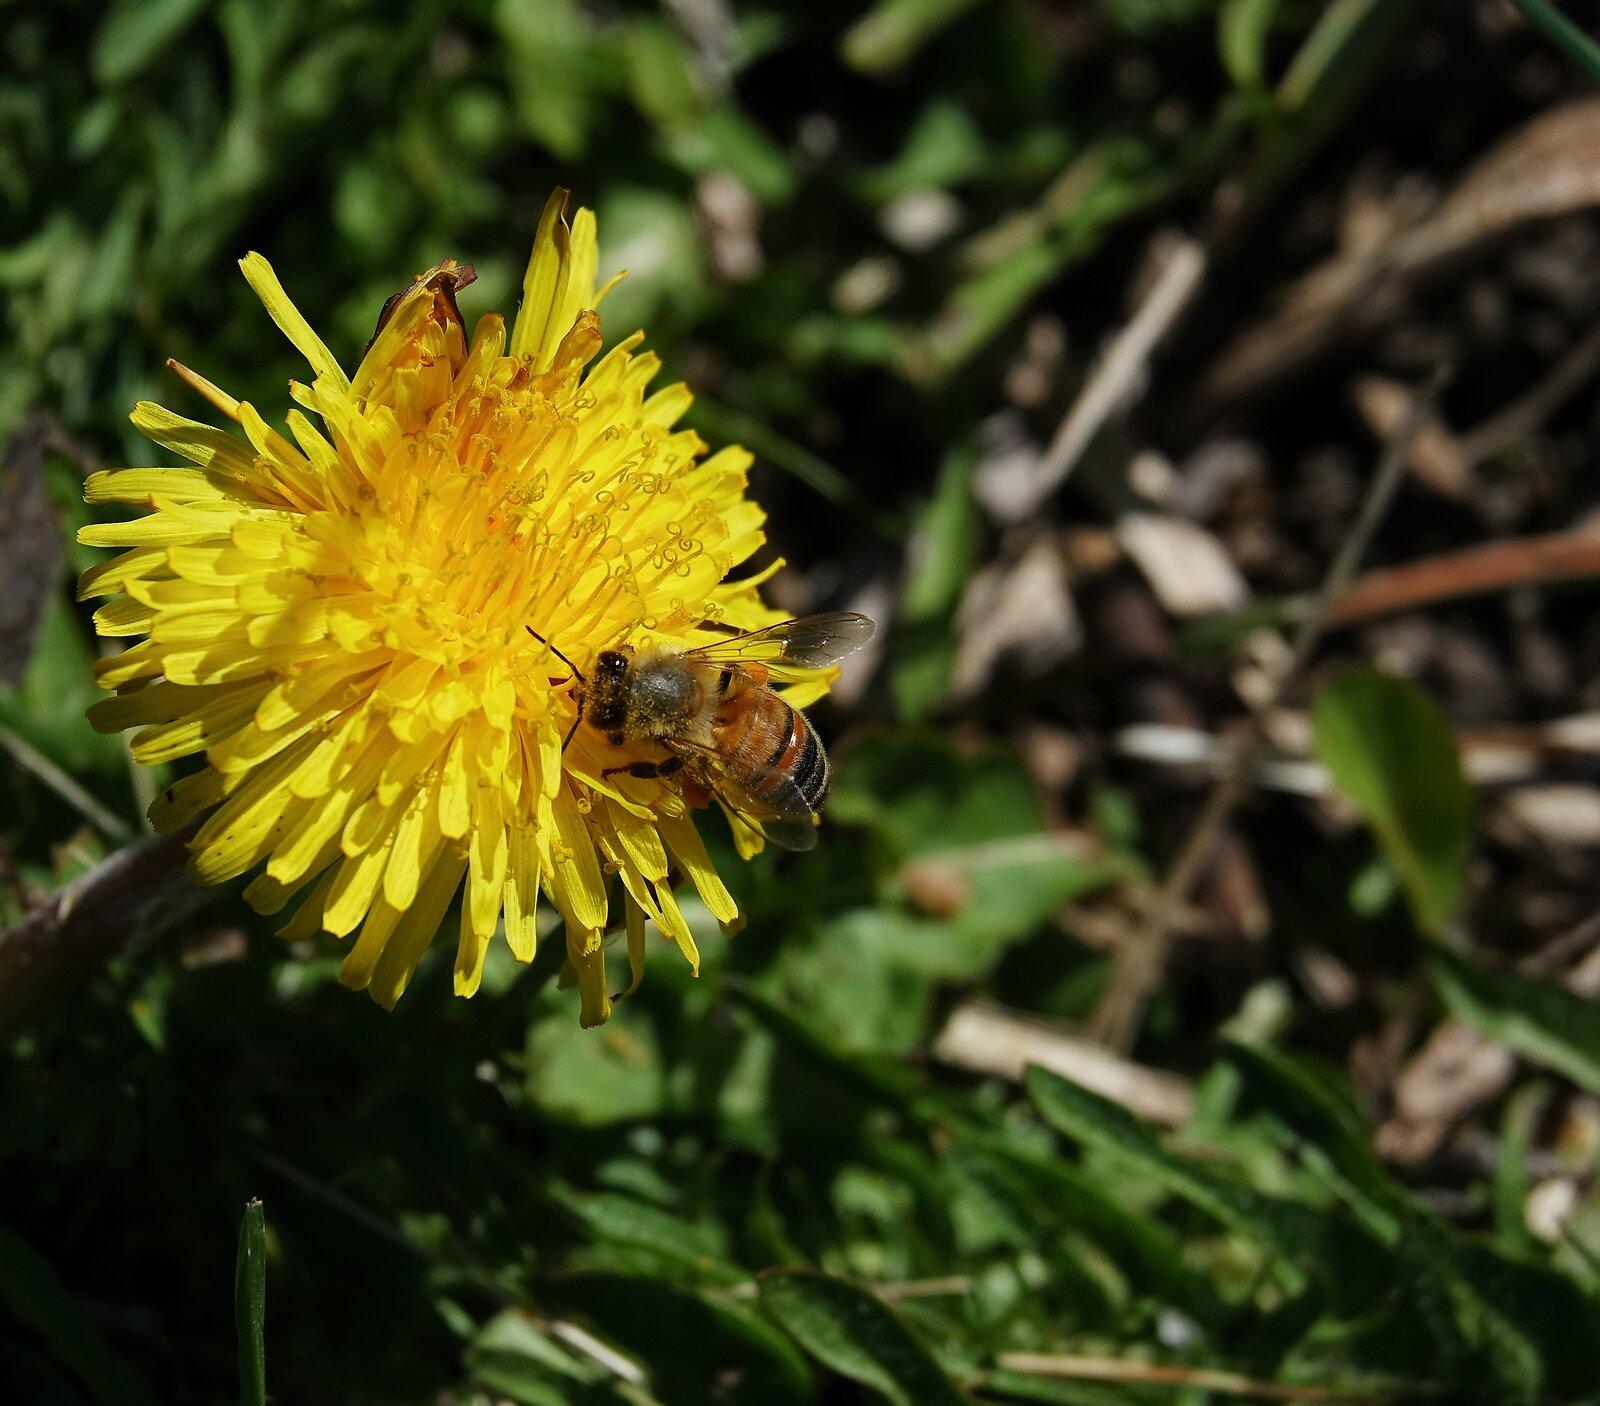 RX10_Apr5_21_busy_as_a_bee#1.jpg